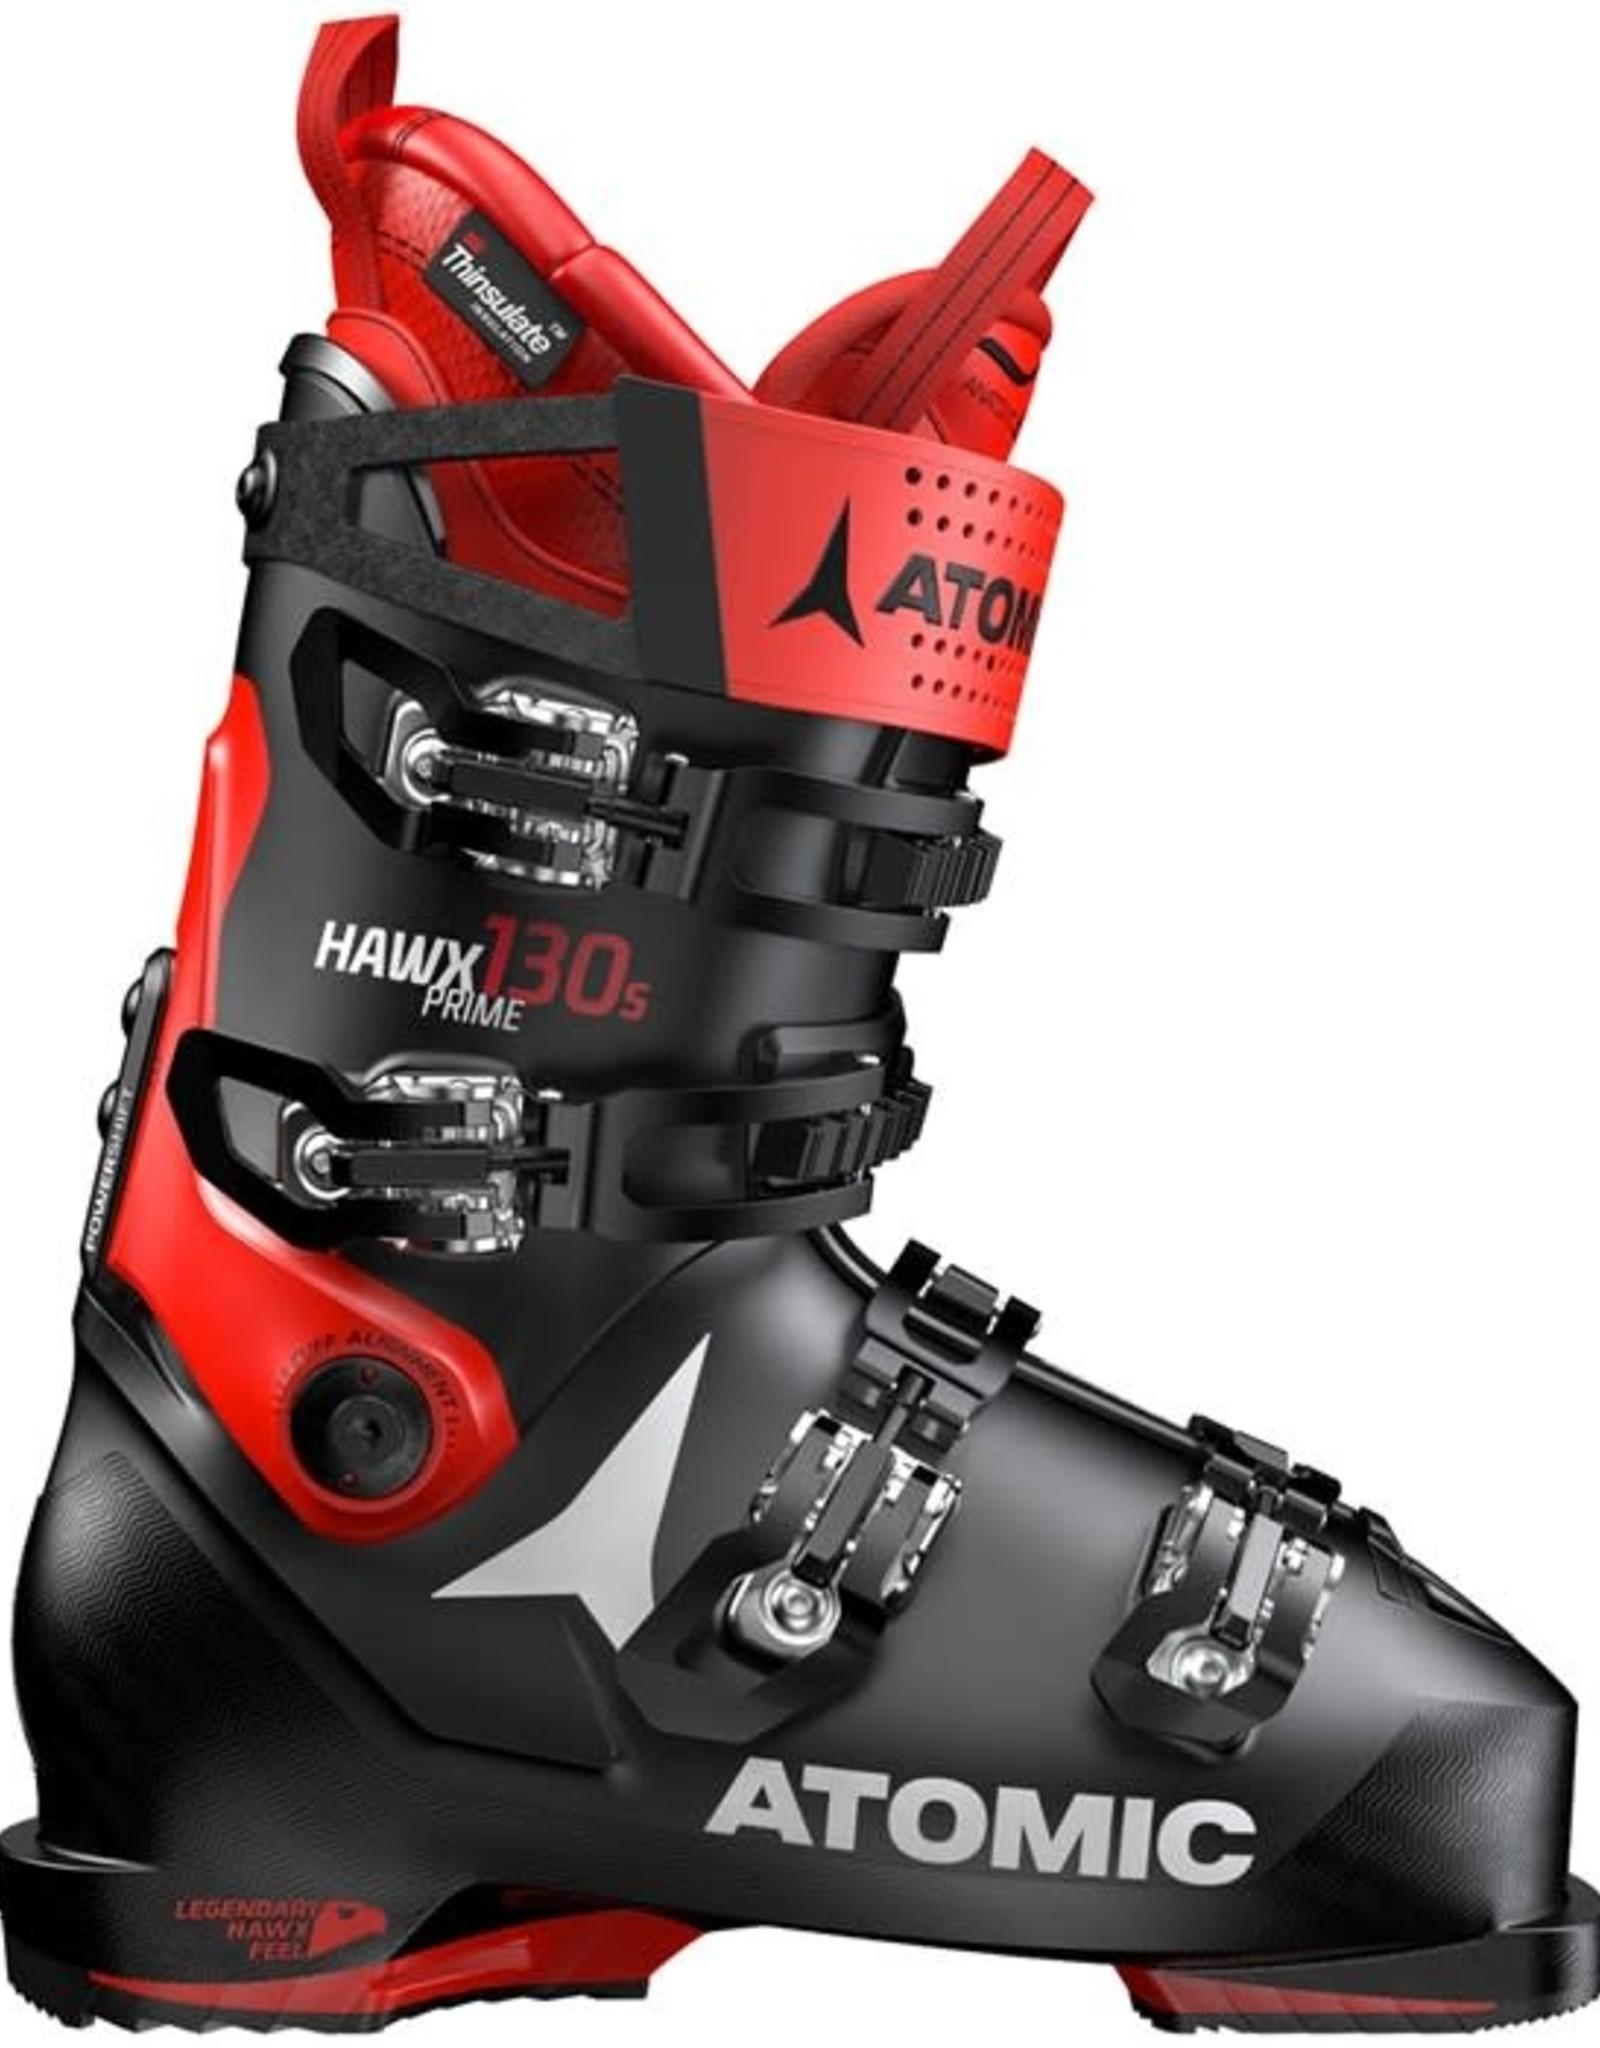 Atomic Hawx Prime 130 Homme